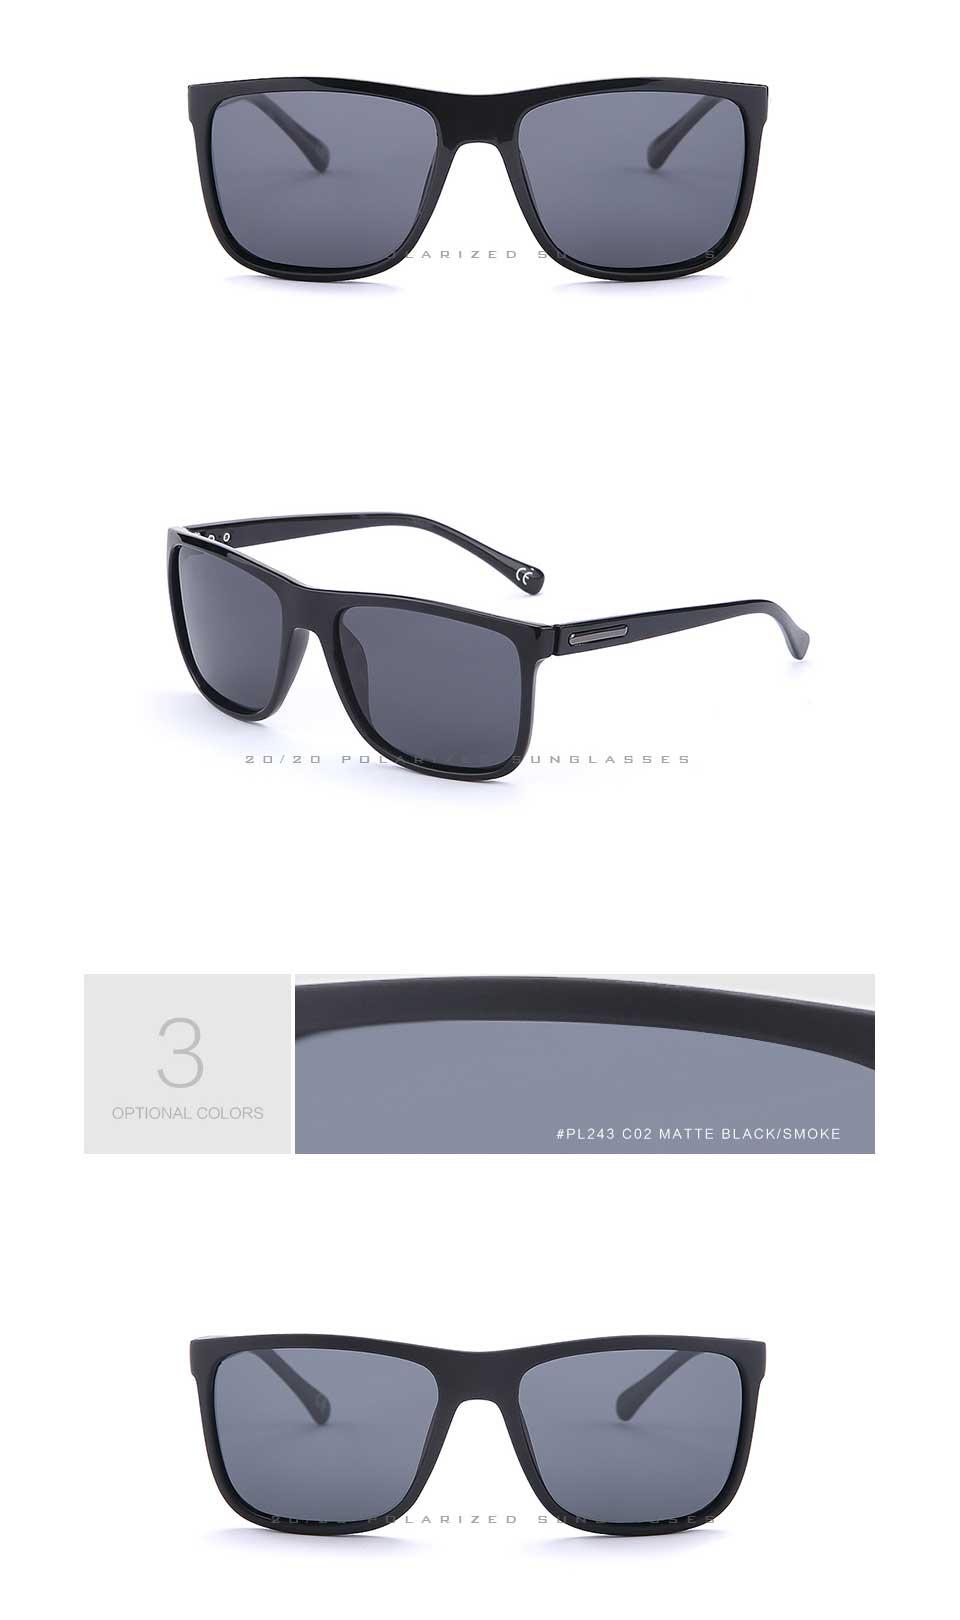 Gafas sunglasses Oculos UV400 4